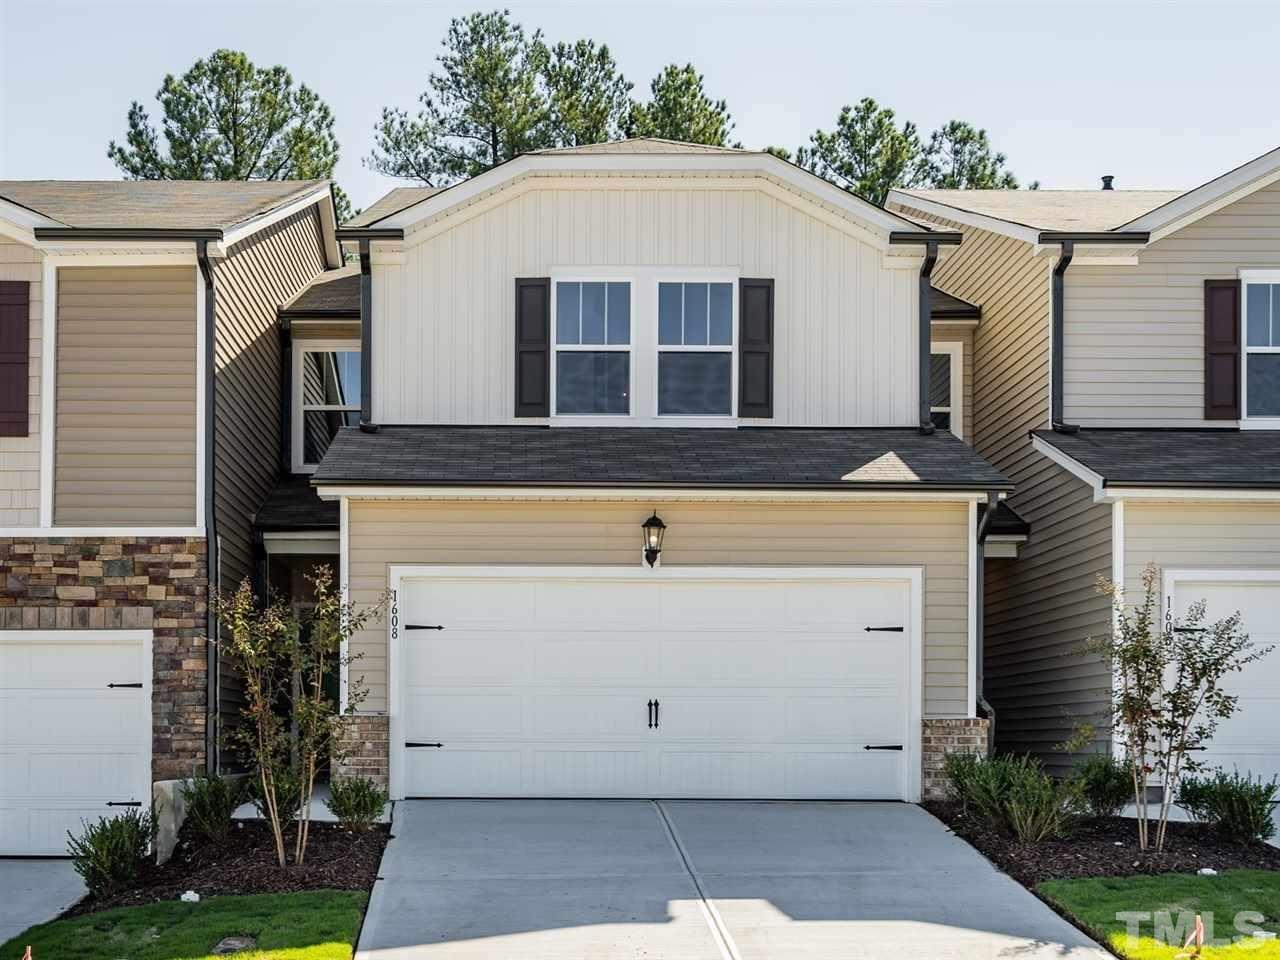 1608 Clayfire Drive, Cary, NC 27519 - MLS#: 2324054